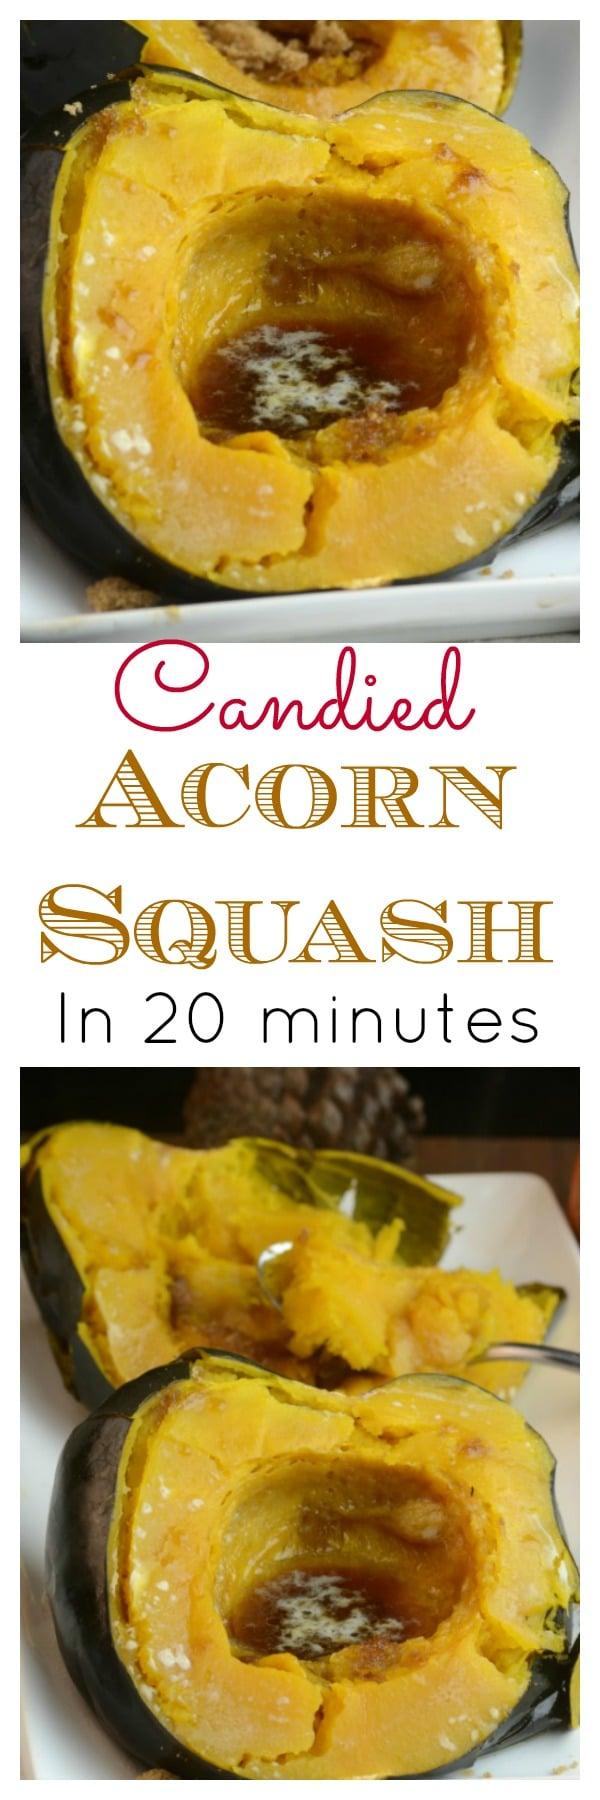 how to cook acorn squash in instant pot